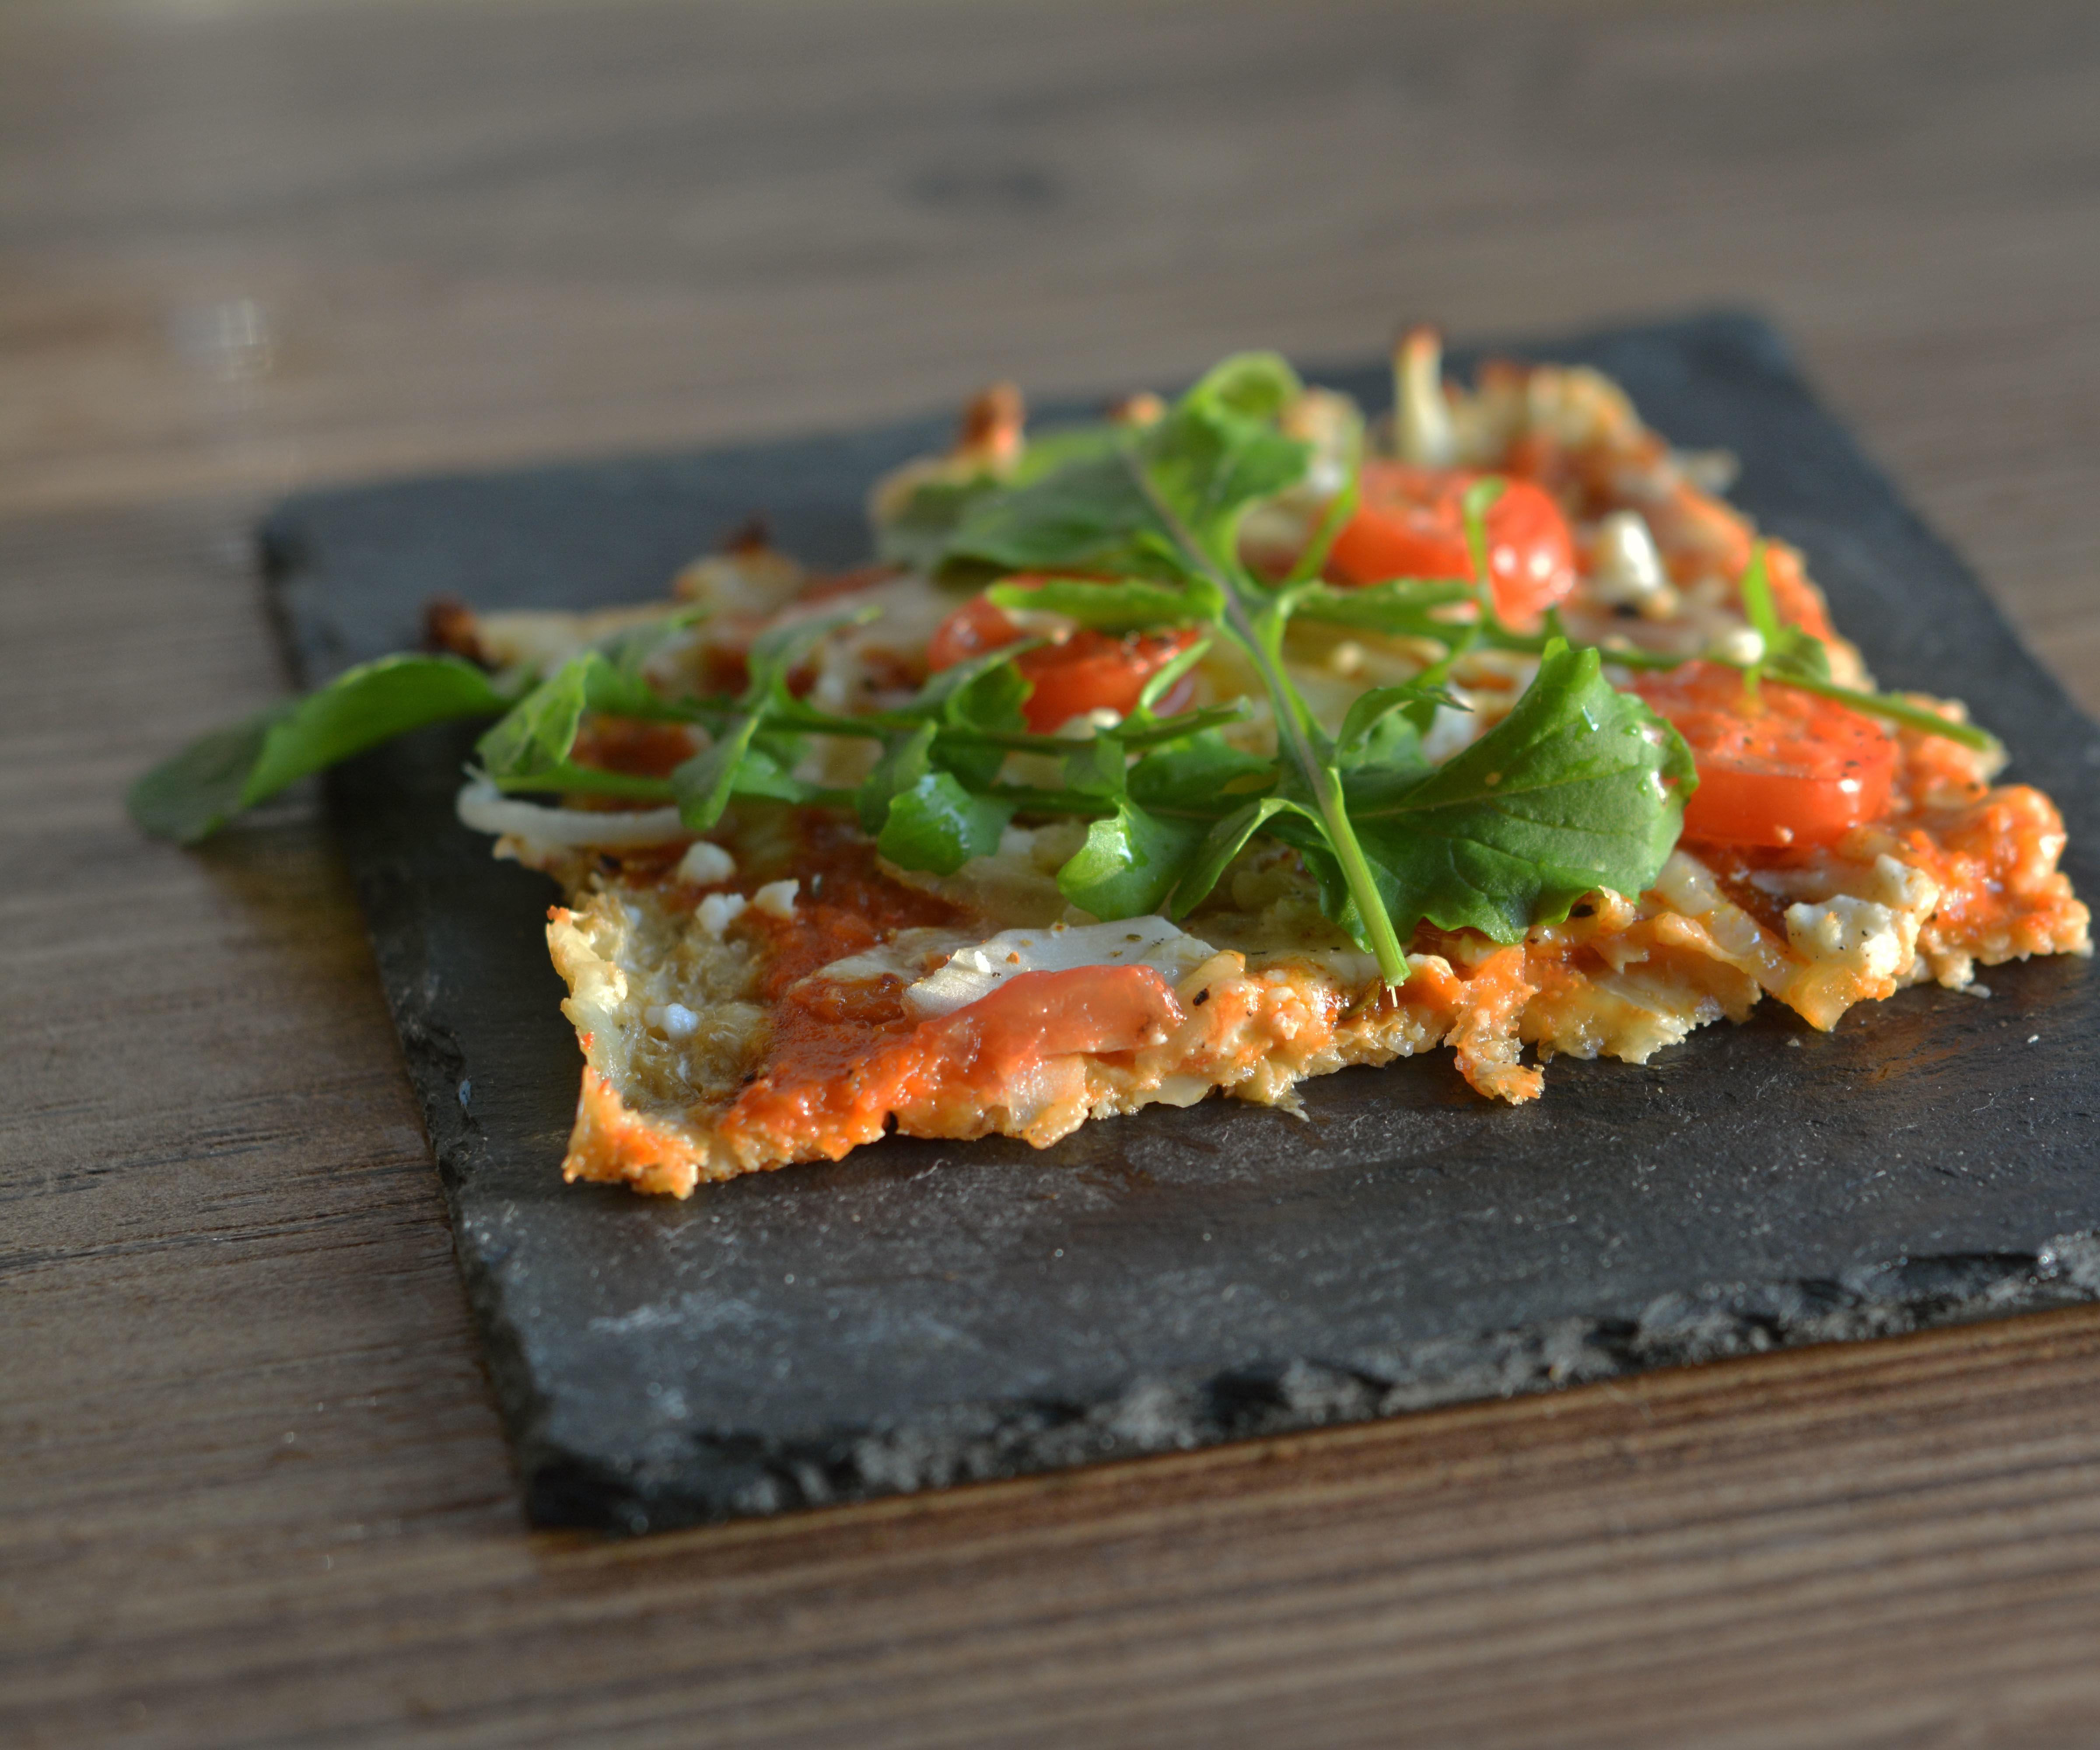 CauliflowerCrust Pizza